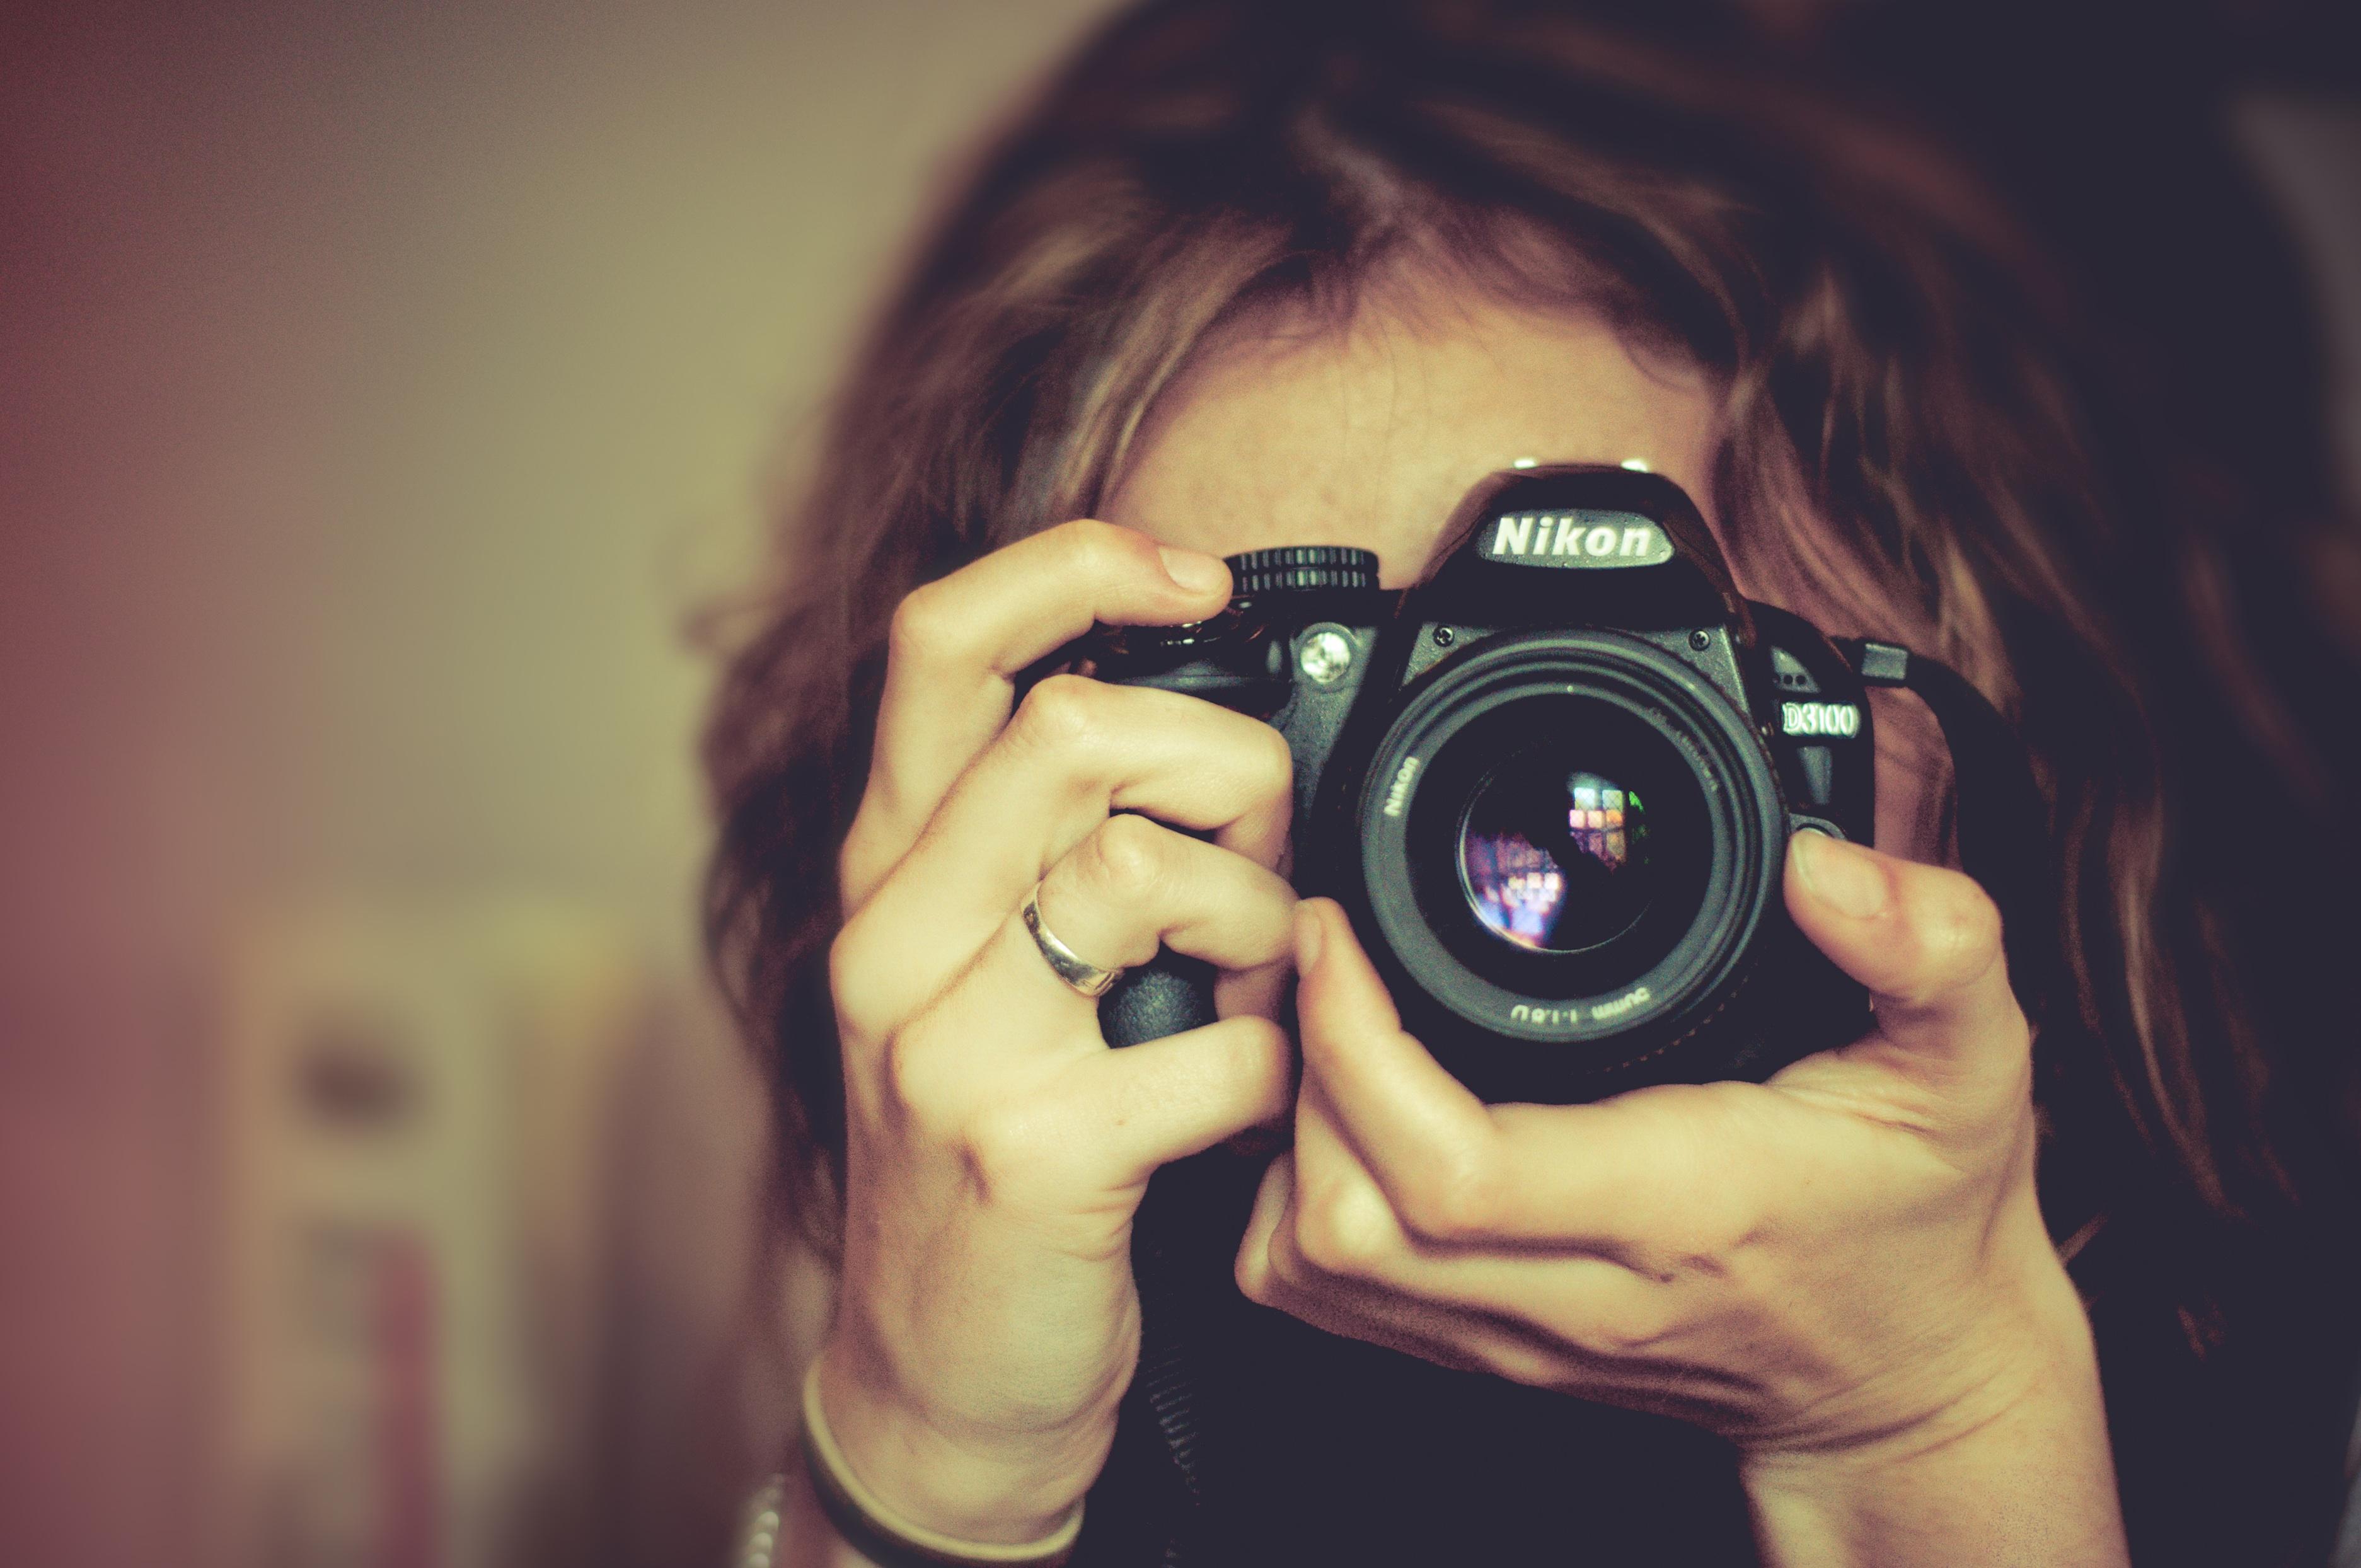 Spanking Photos - Big collection of spanking photosets! Award winning flower photography